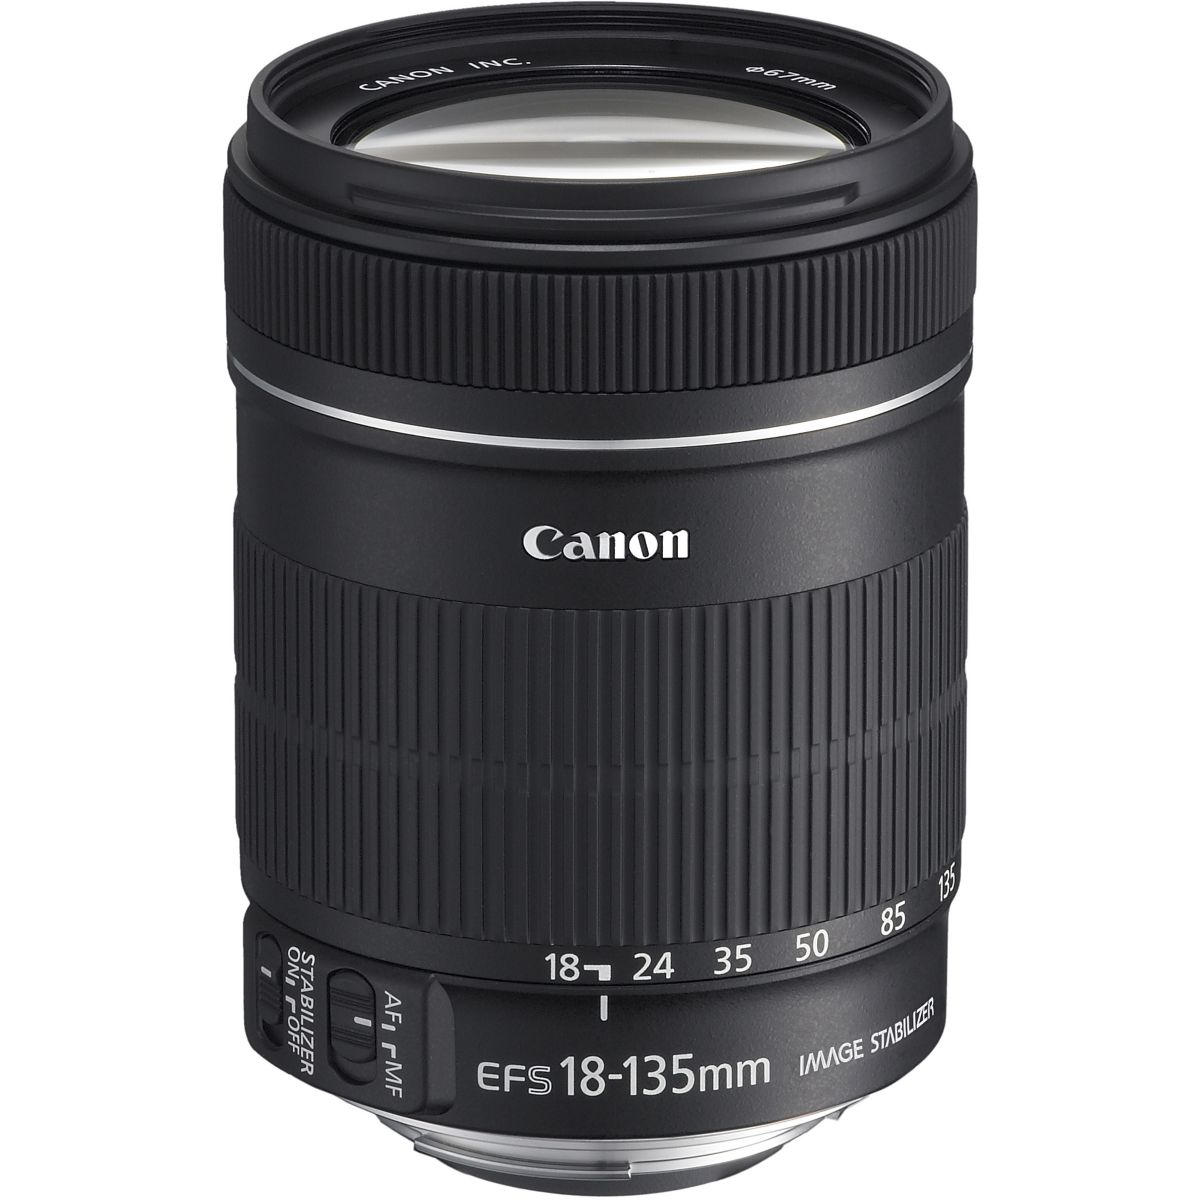 Objectif canon ef-s 18-135mm f/3,5-5,6 is - livraison offerte : code liv